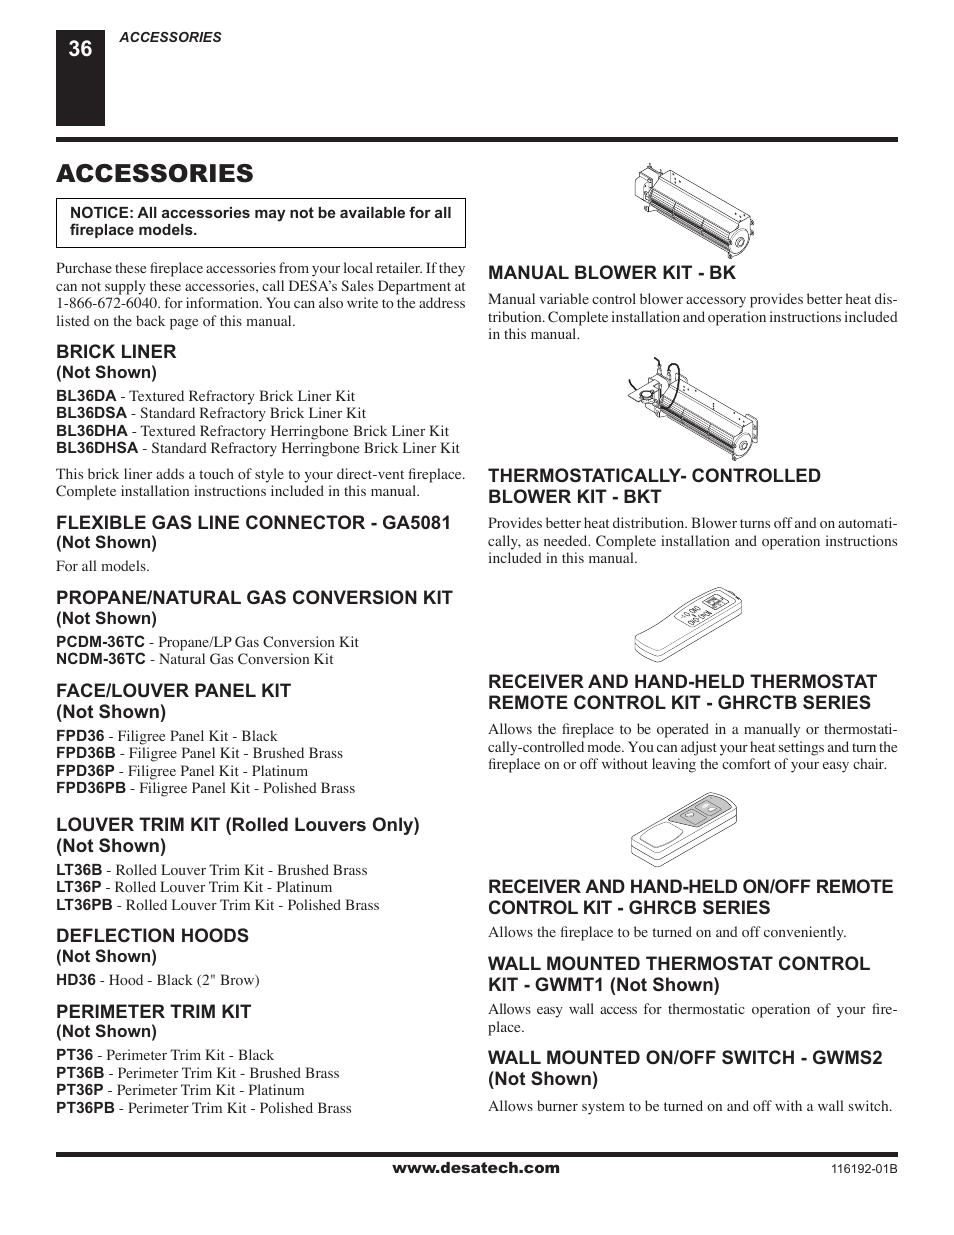 accessories desa v tc36n series user manual page 36 40